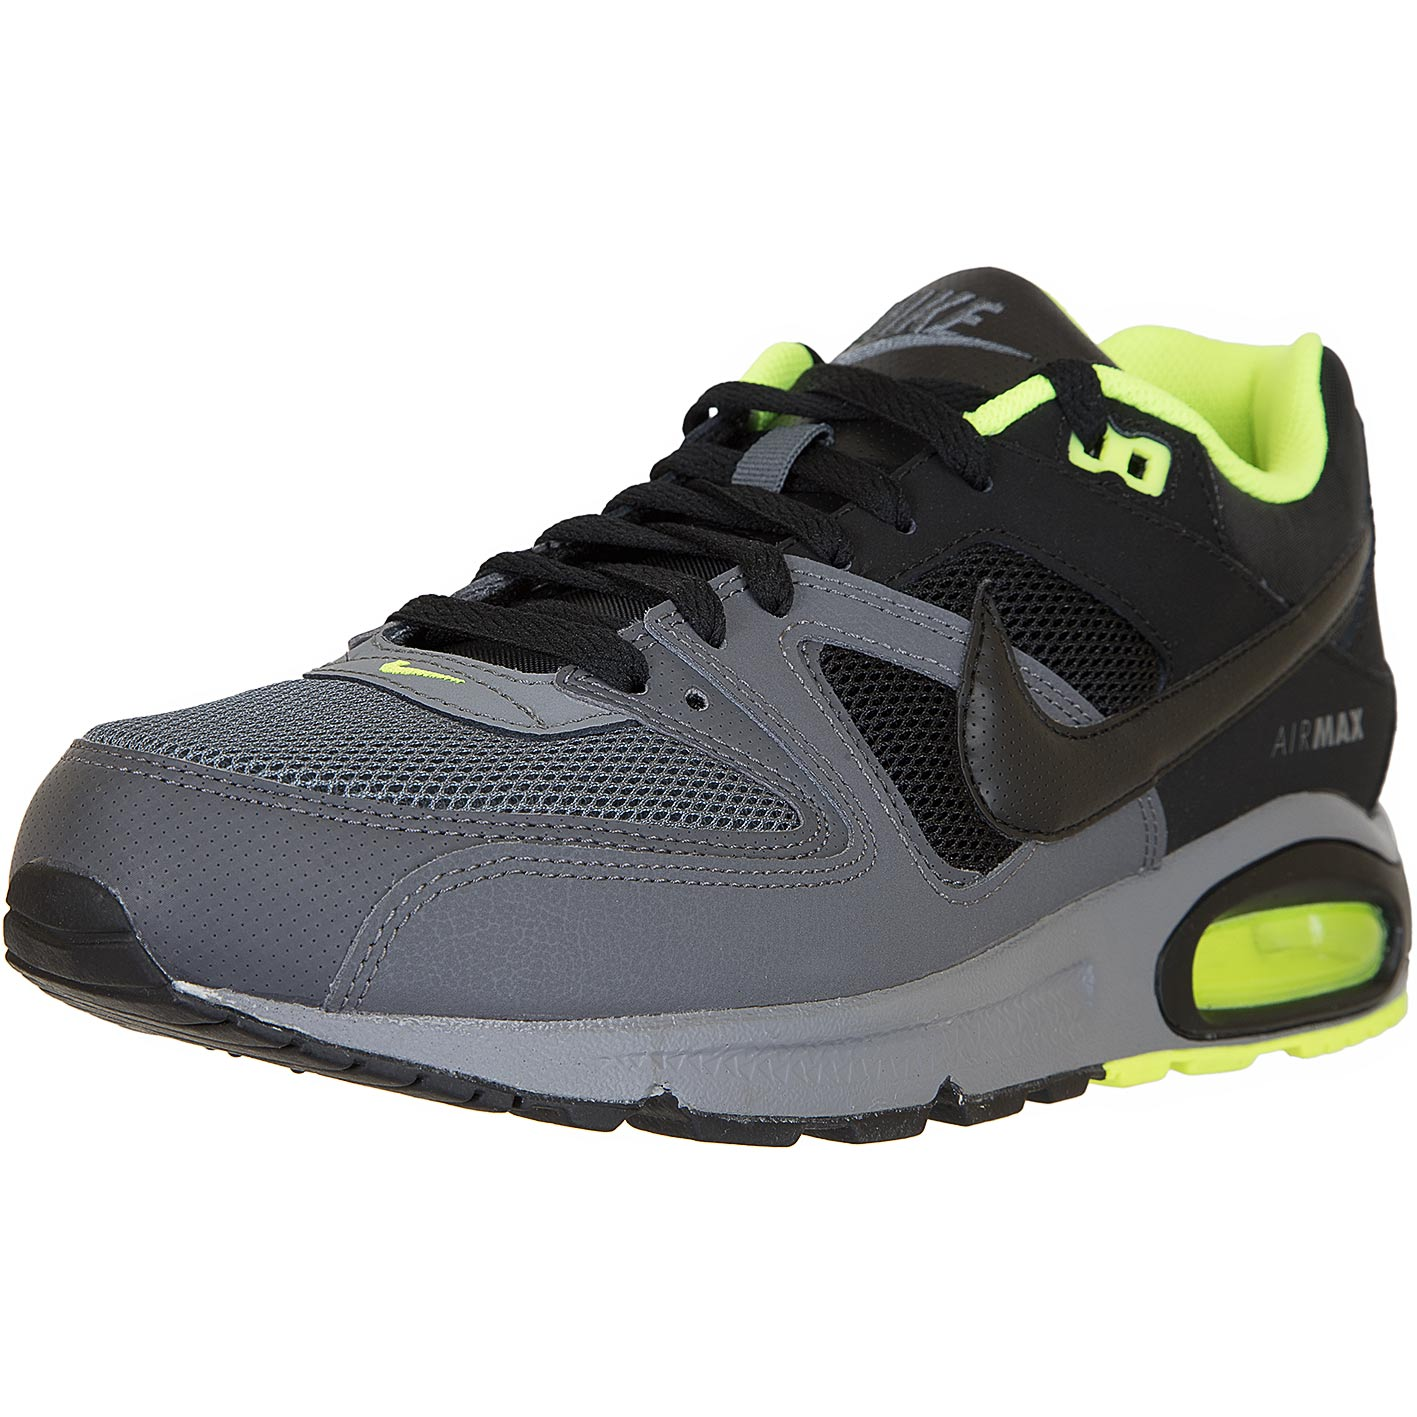 nike boots grau, Nike sneaker air max command schwarz grau